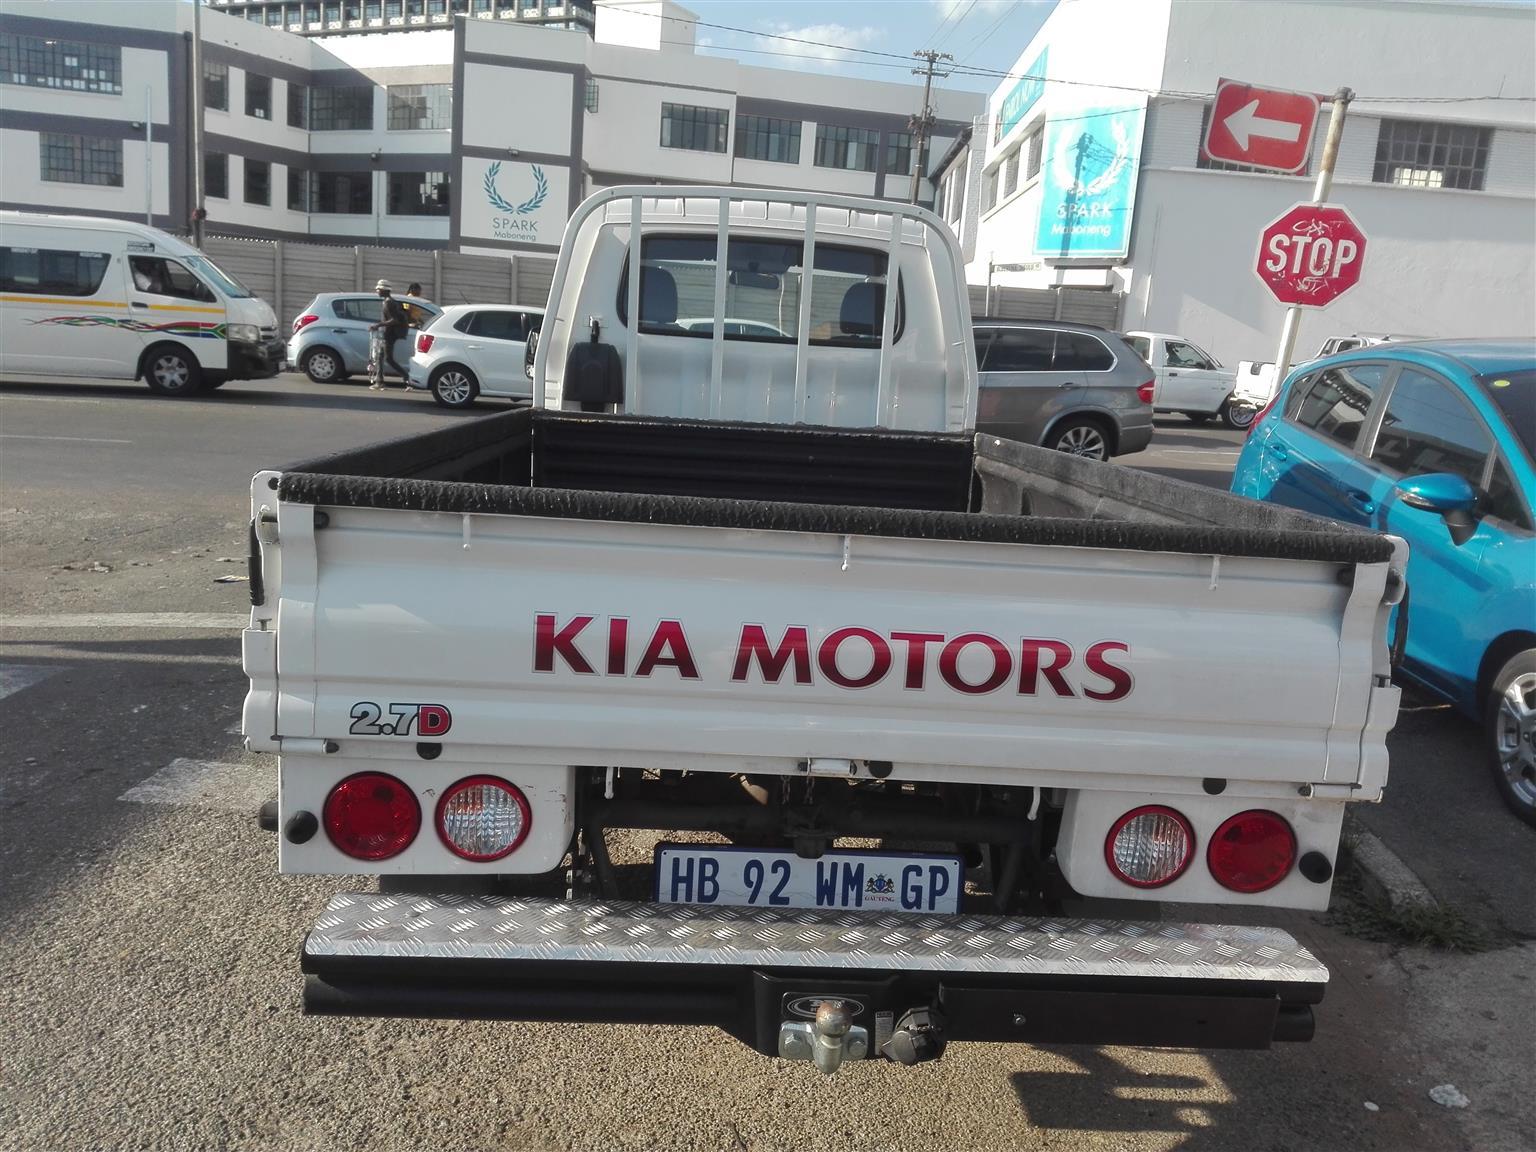 2017 Kia K2700/K2500 K2700 2 7D workhorse chassis cab | Junk Mail